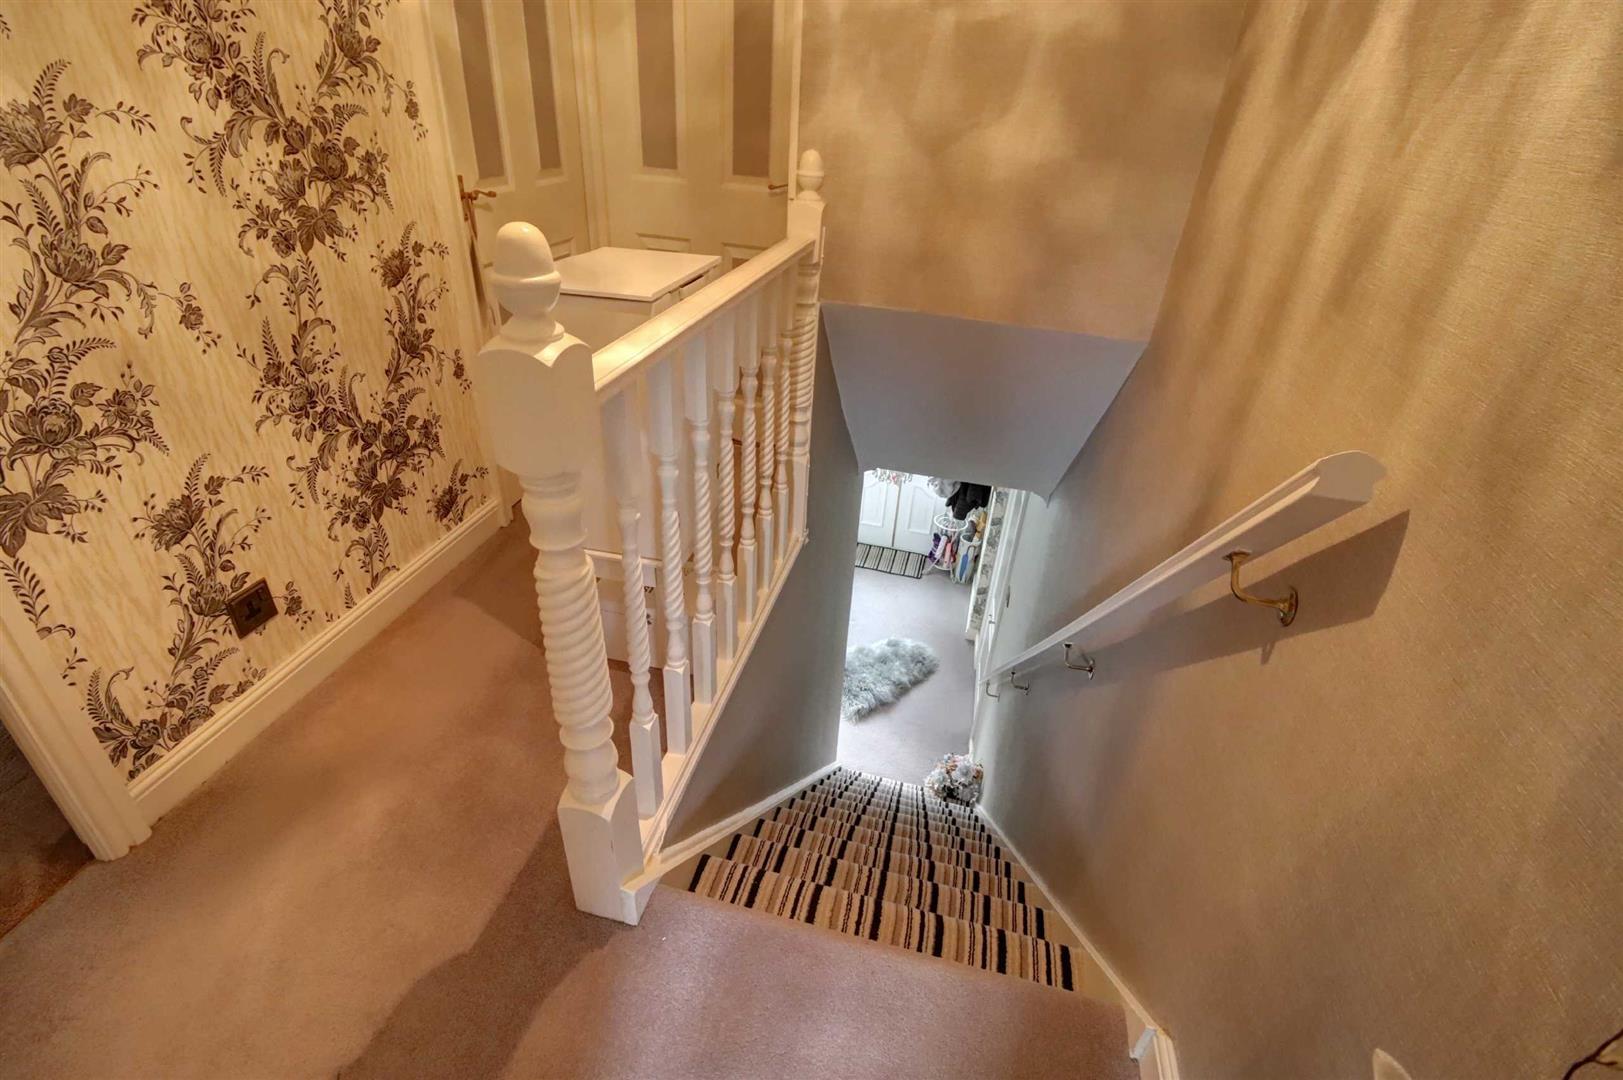 3 Bedroom Detached House For Sale - Image 23